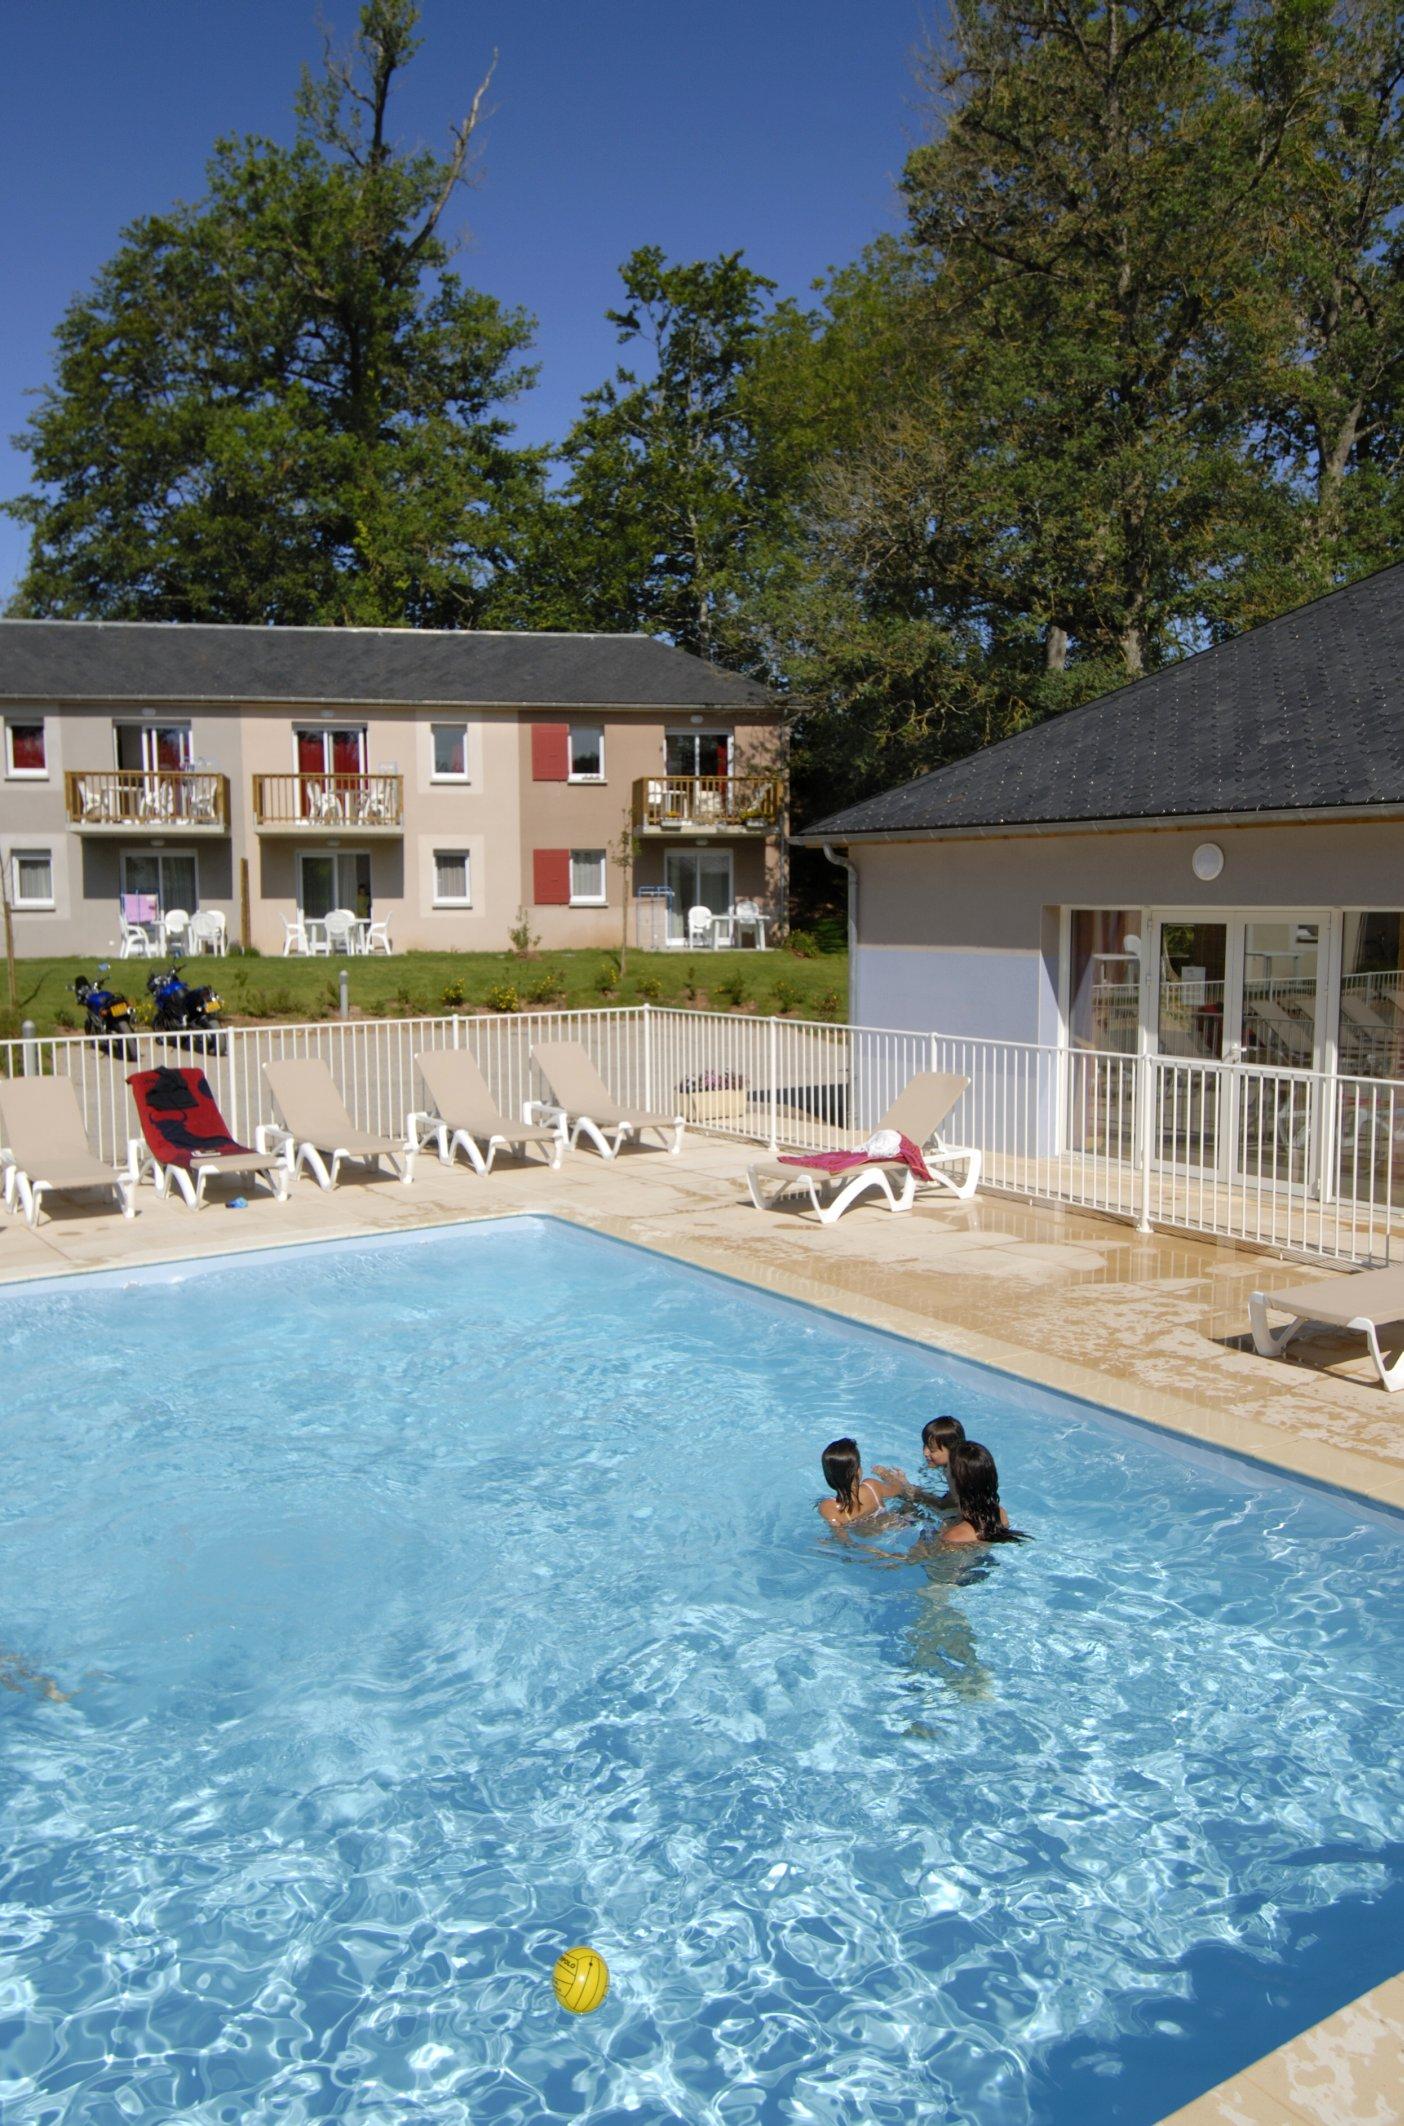 Odalys Rignac 2pC6 Garden for 6 guests in Rignac, France